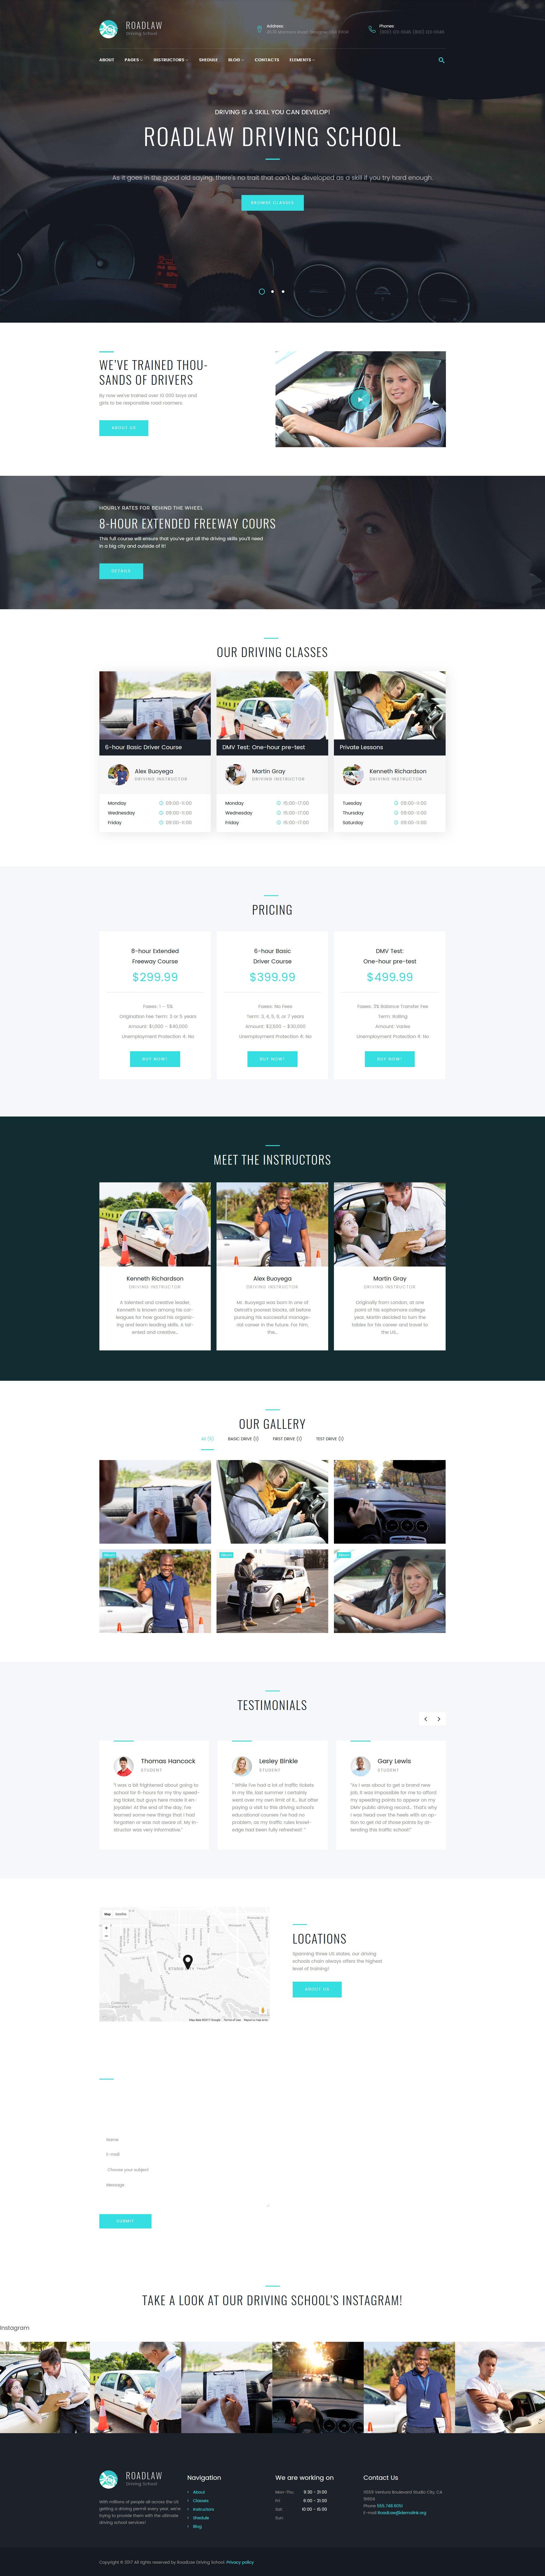 RoadLaw - Driving School Responsive WordPress Theme №63631 - скриншот